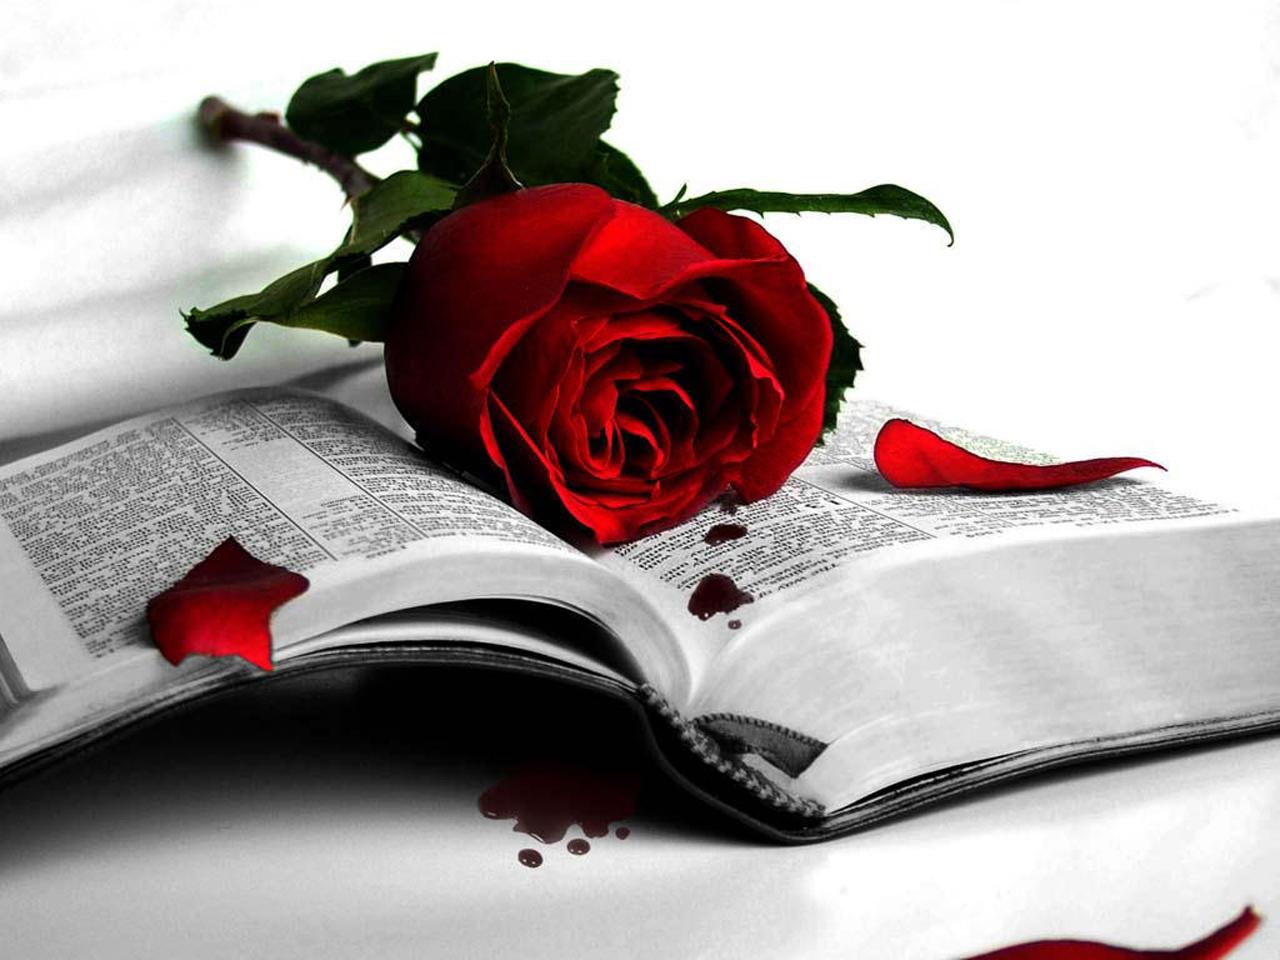 Red mawar